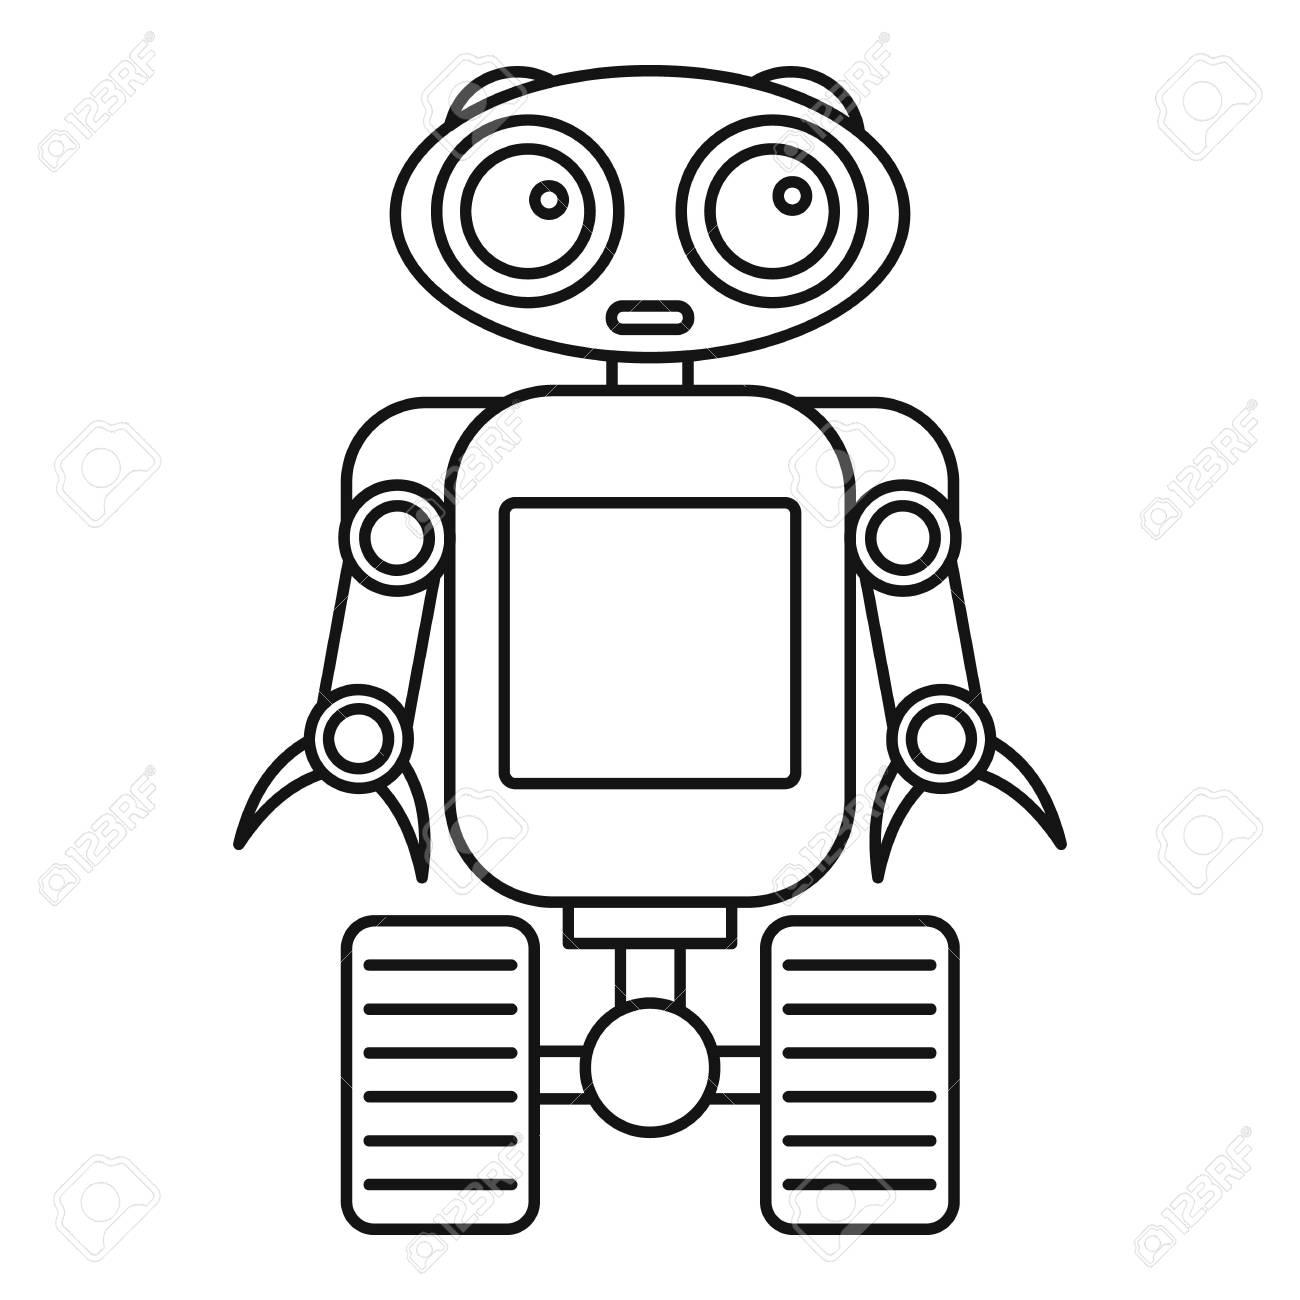 Cute Robot Drawing At Getdrawings